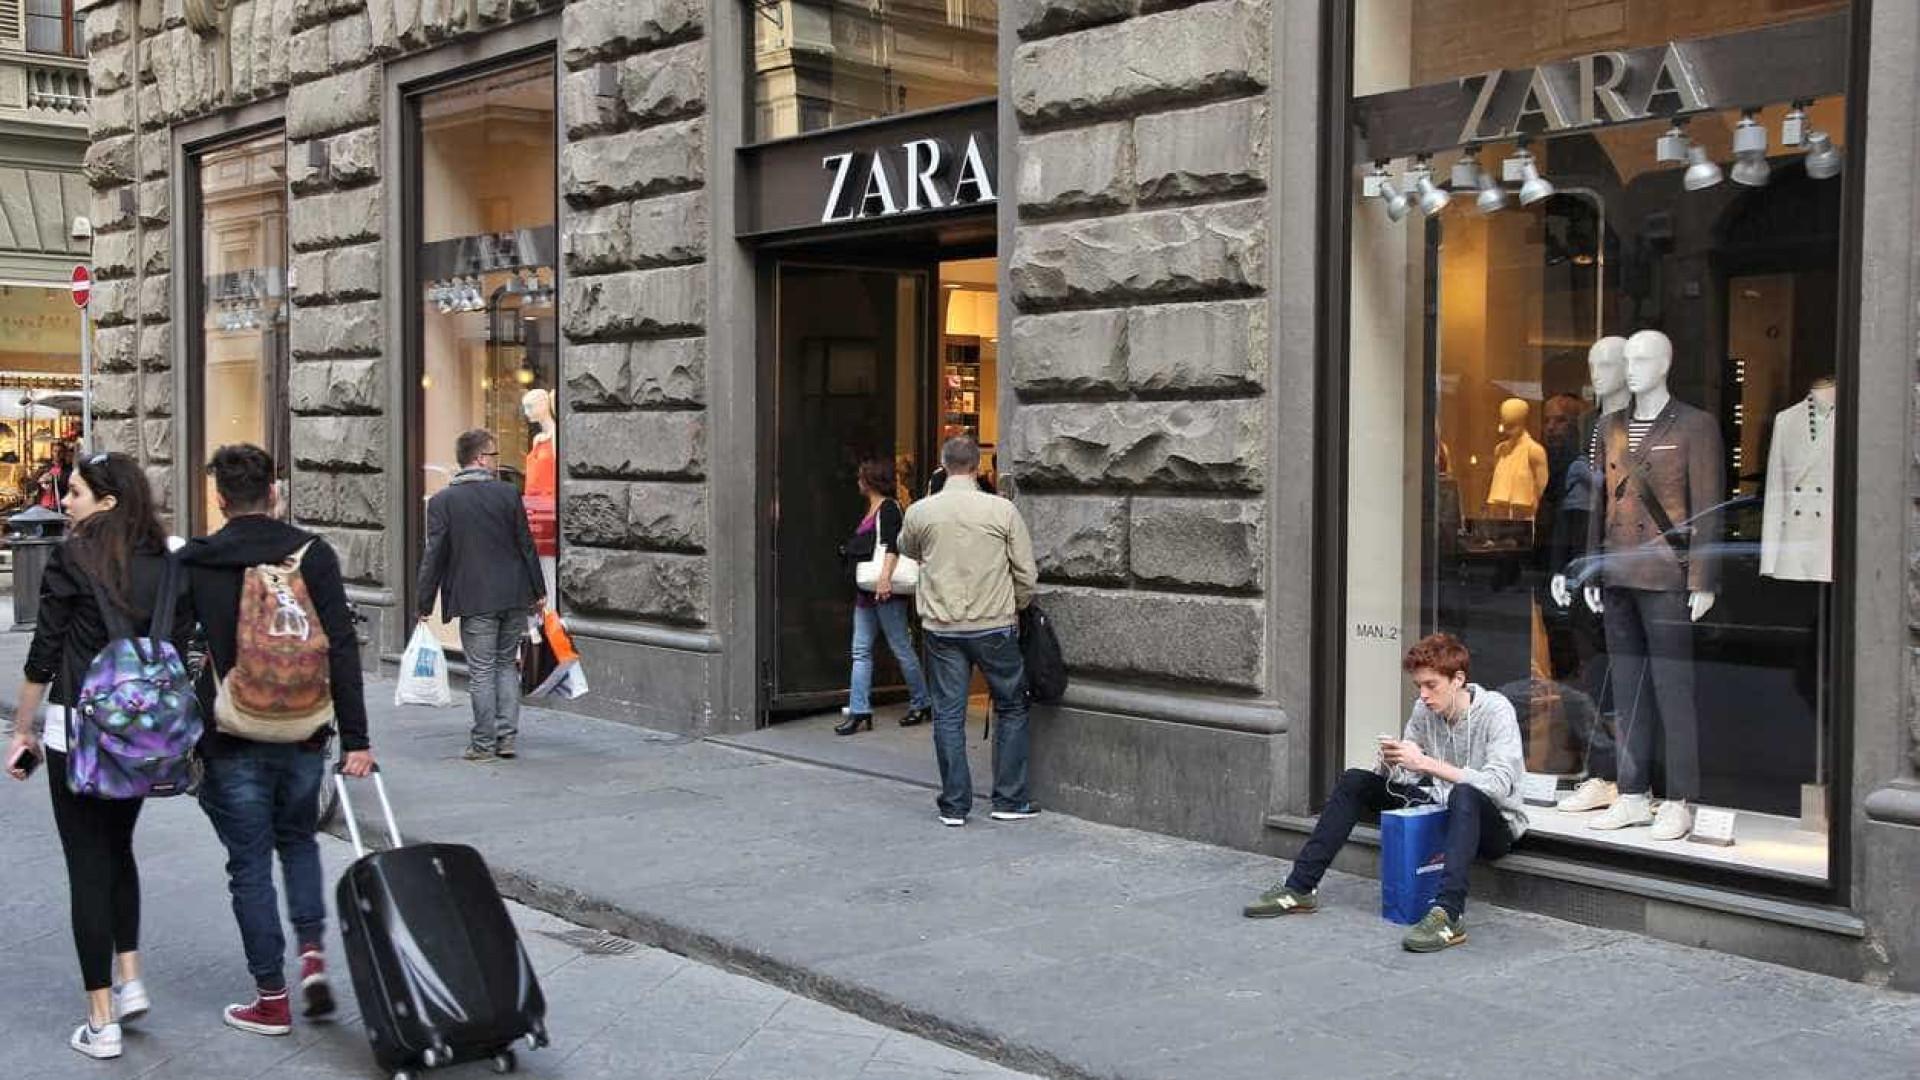 Lucros da dona da Zara crescem 6% entre fevereiro e outubro